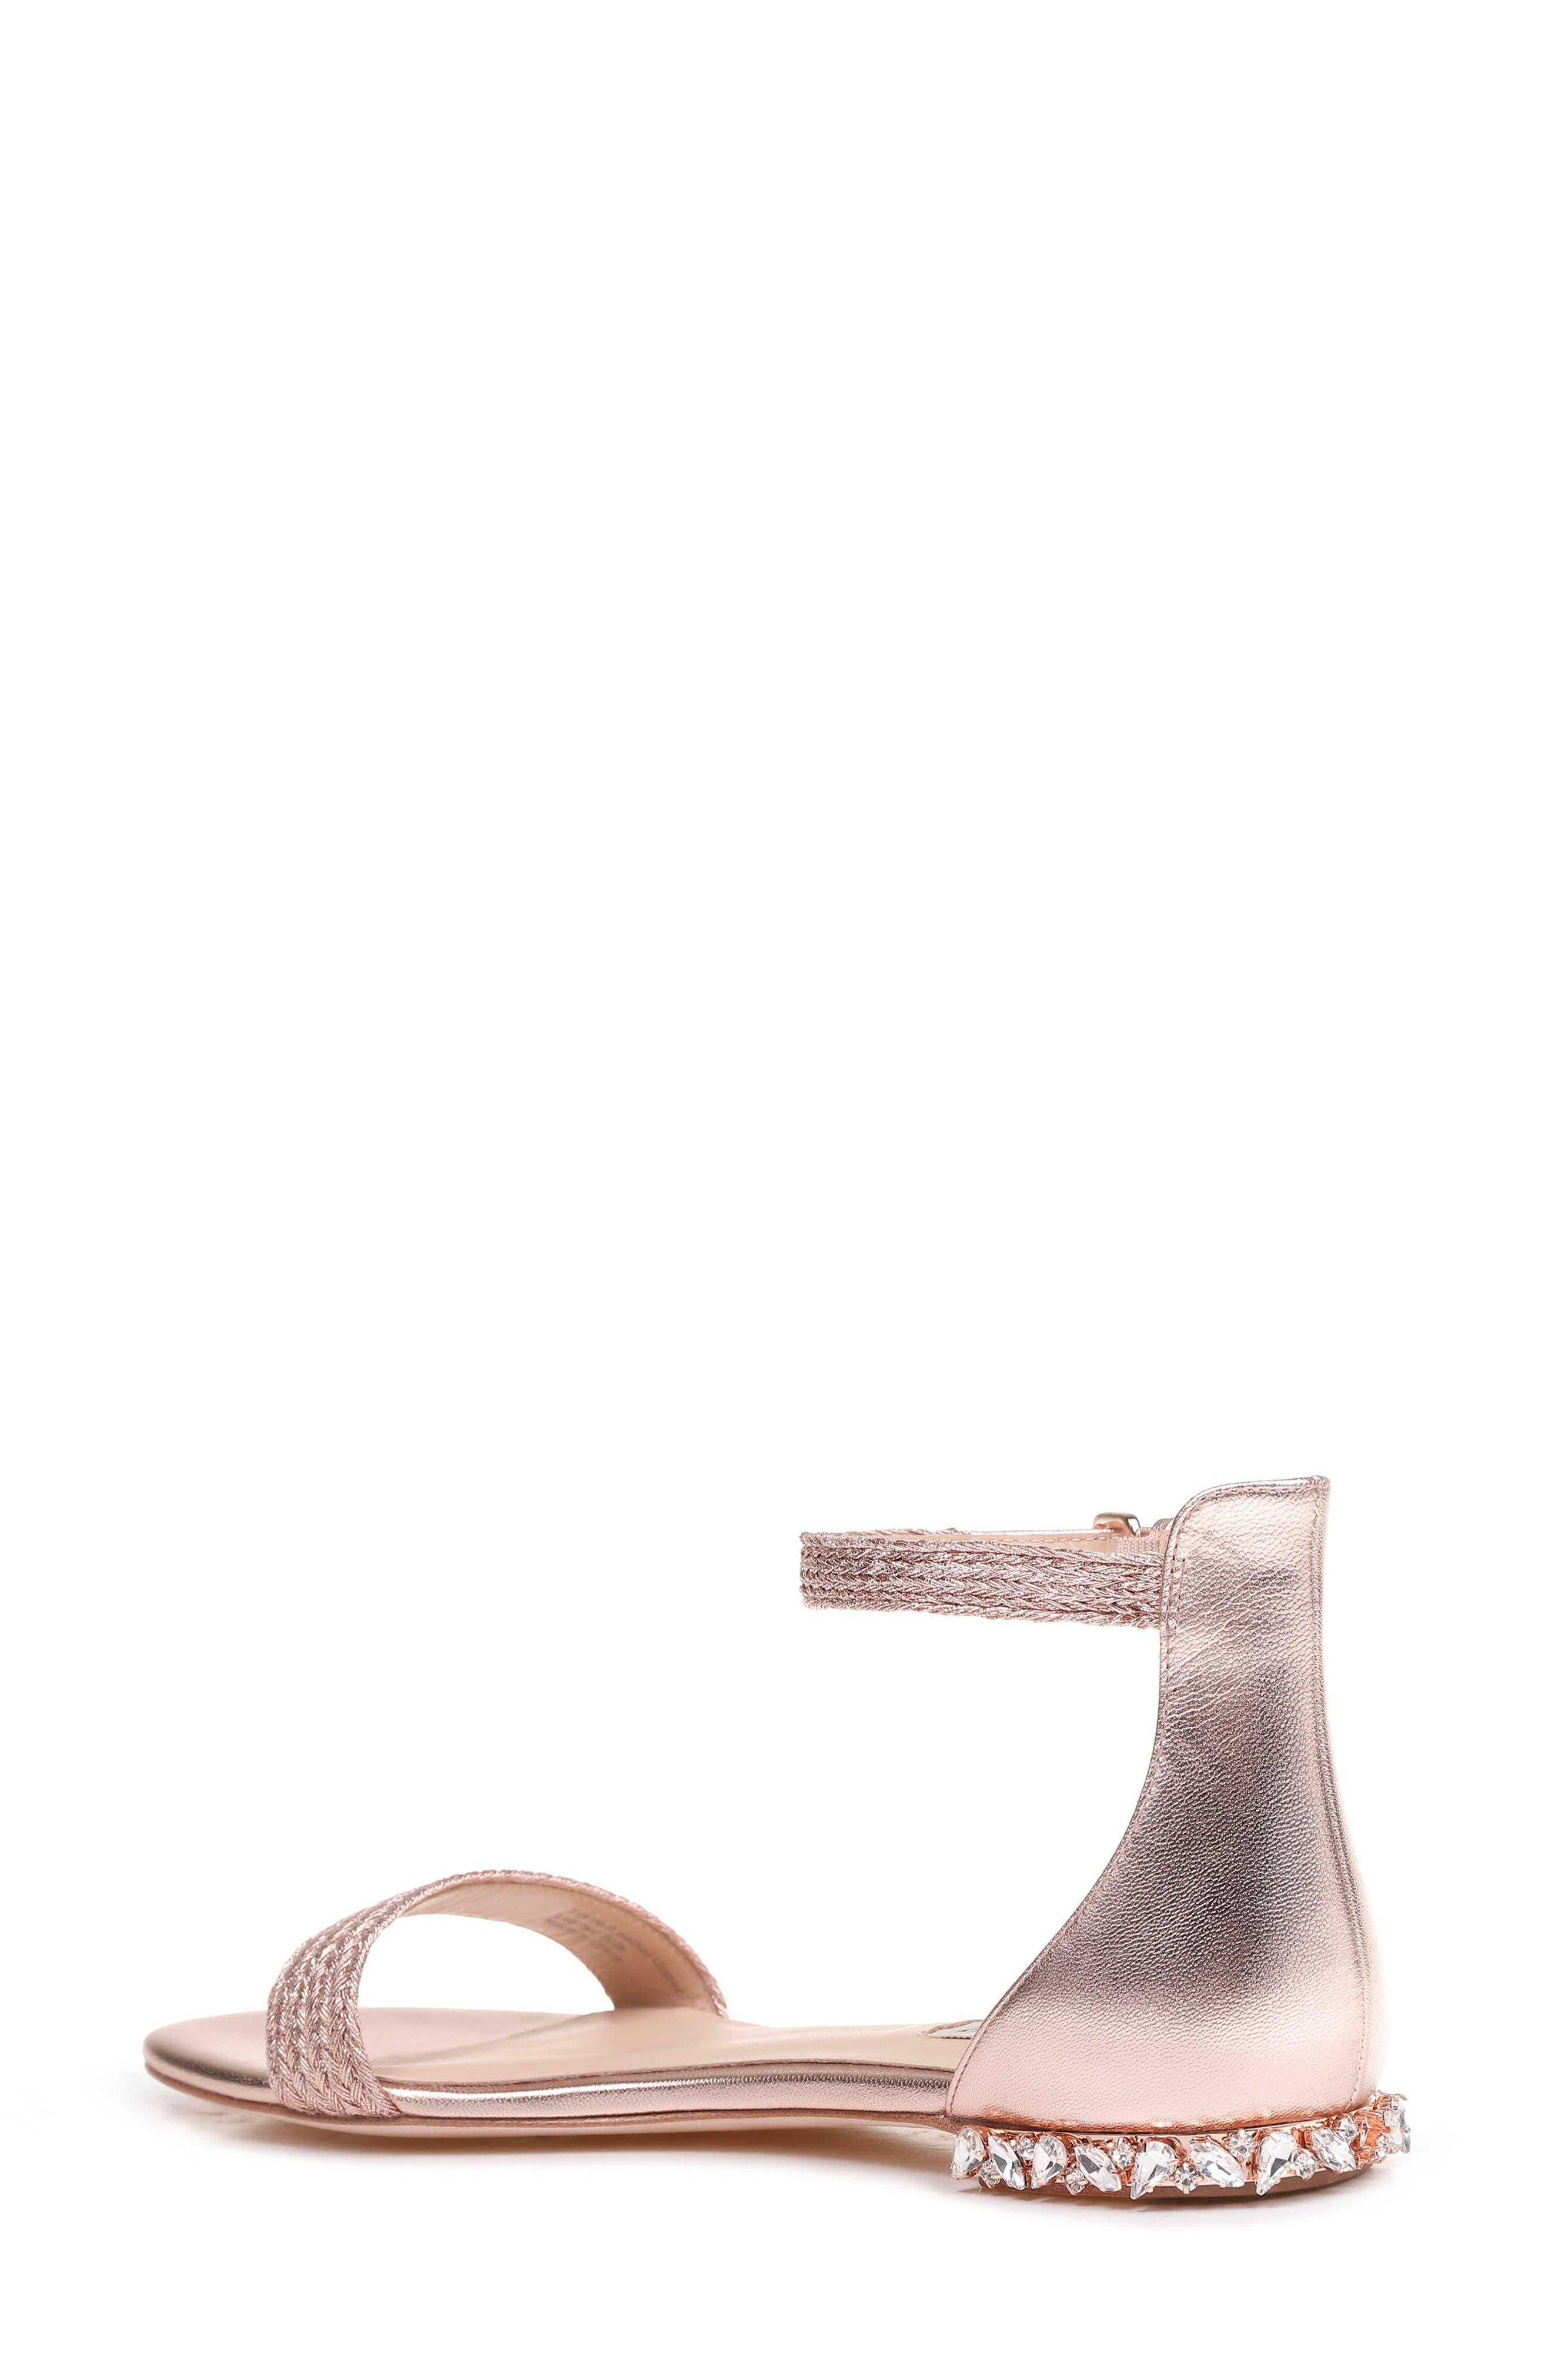 Steffie Ankle Strap Sandal,                             Alternate thumbnail 2, color,                             ROSE GOLD LEATHER